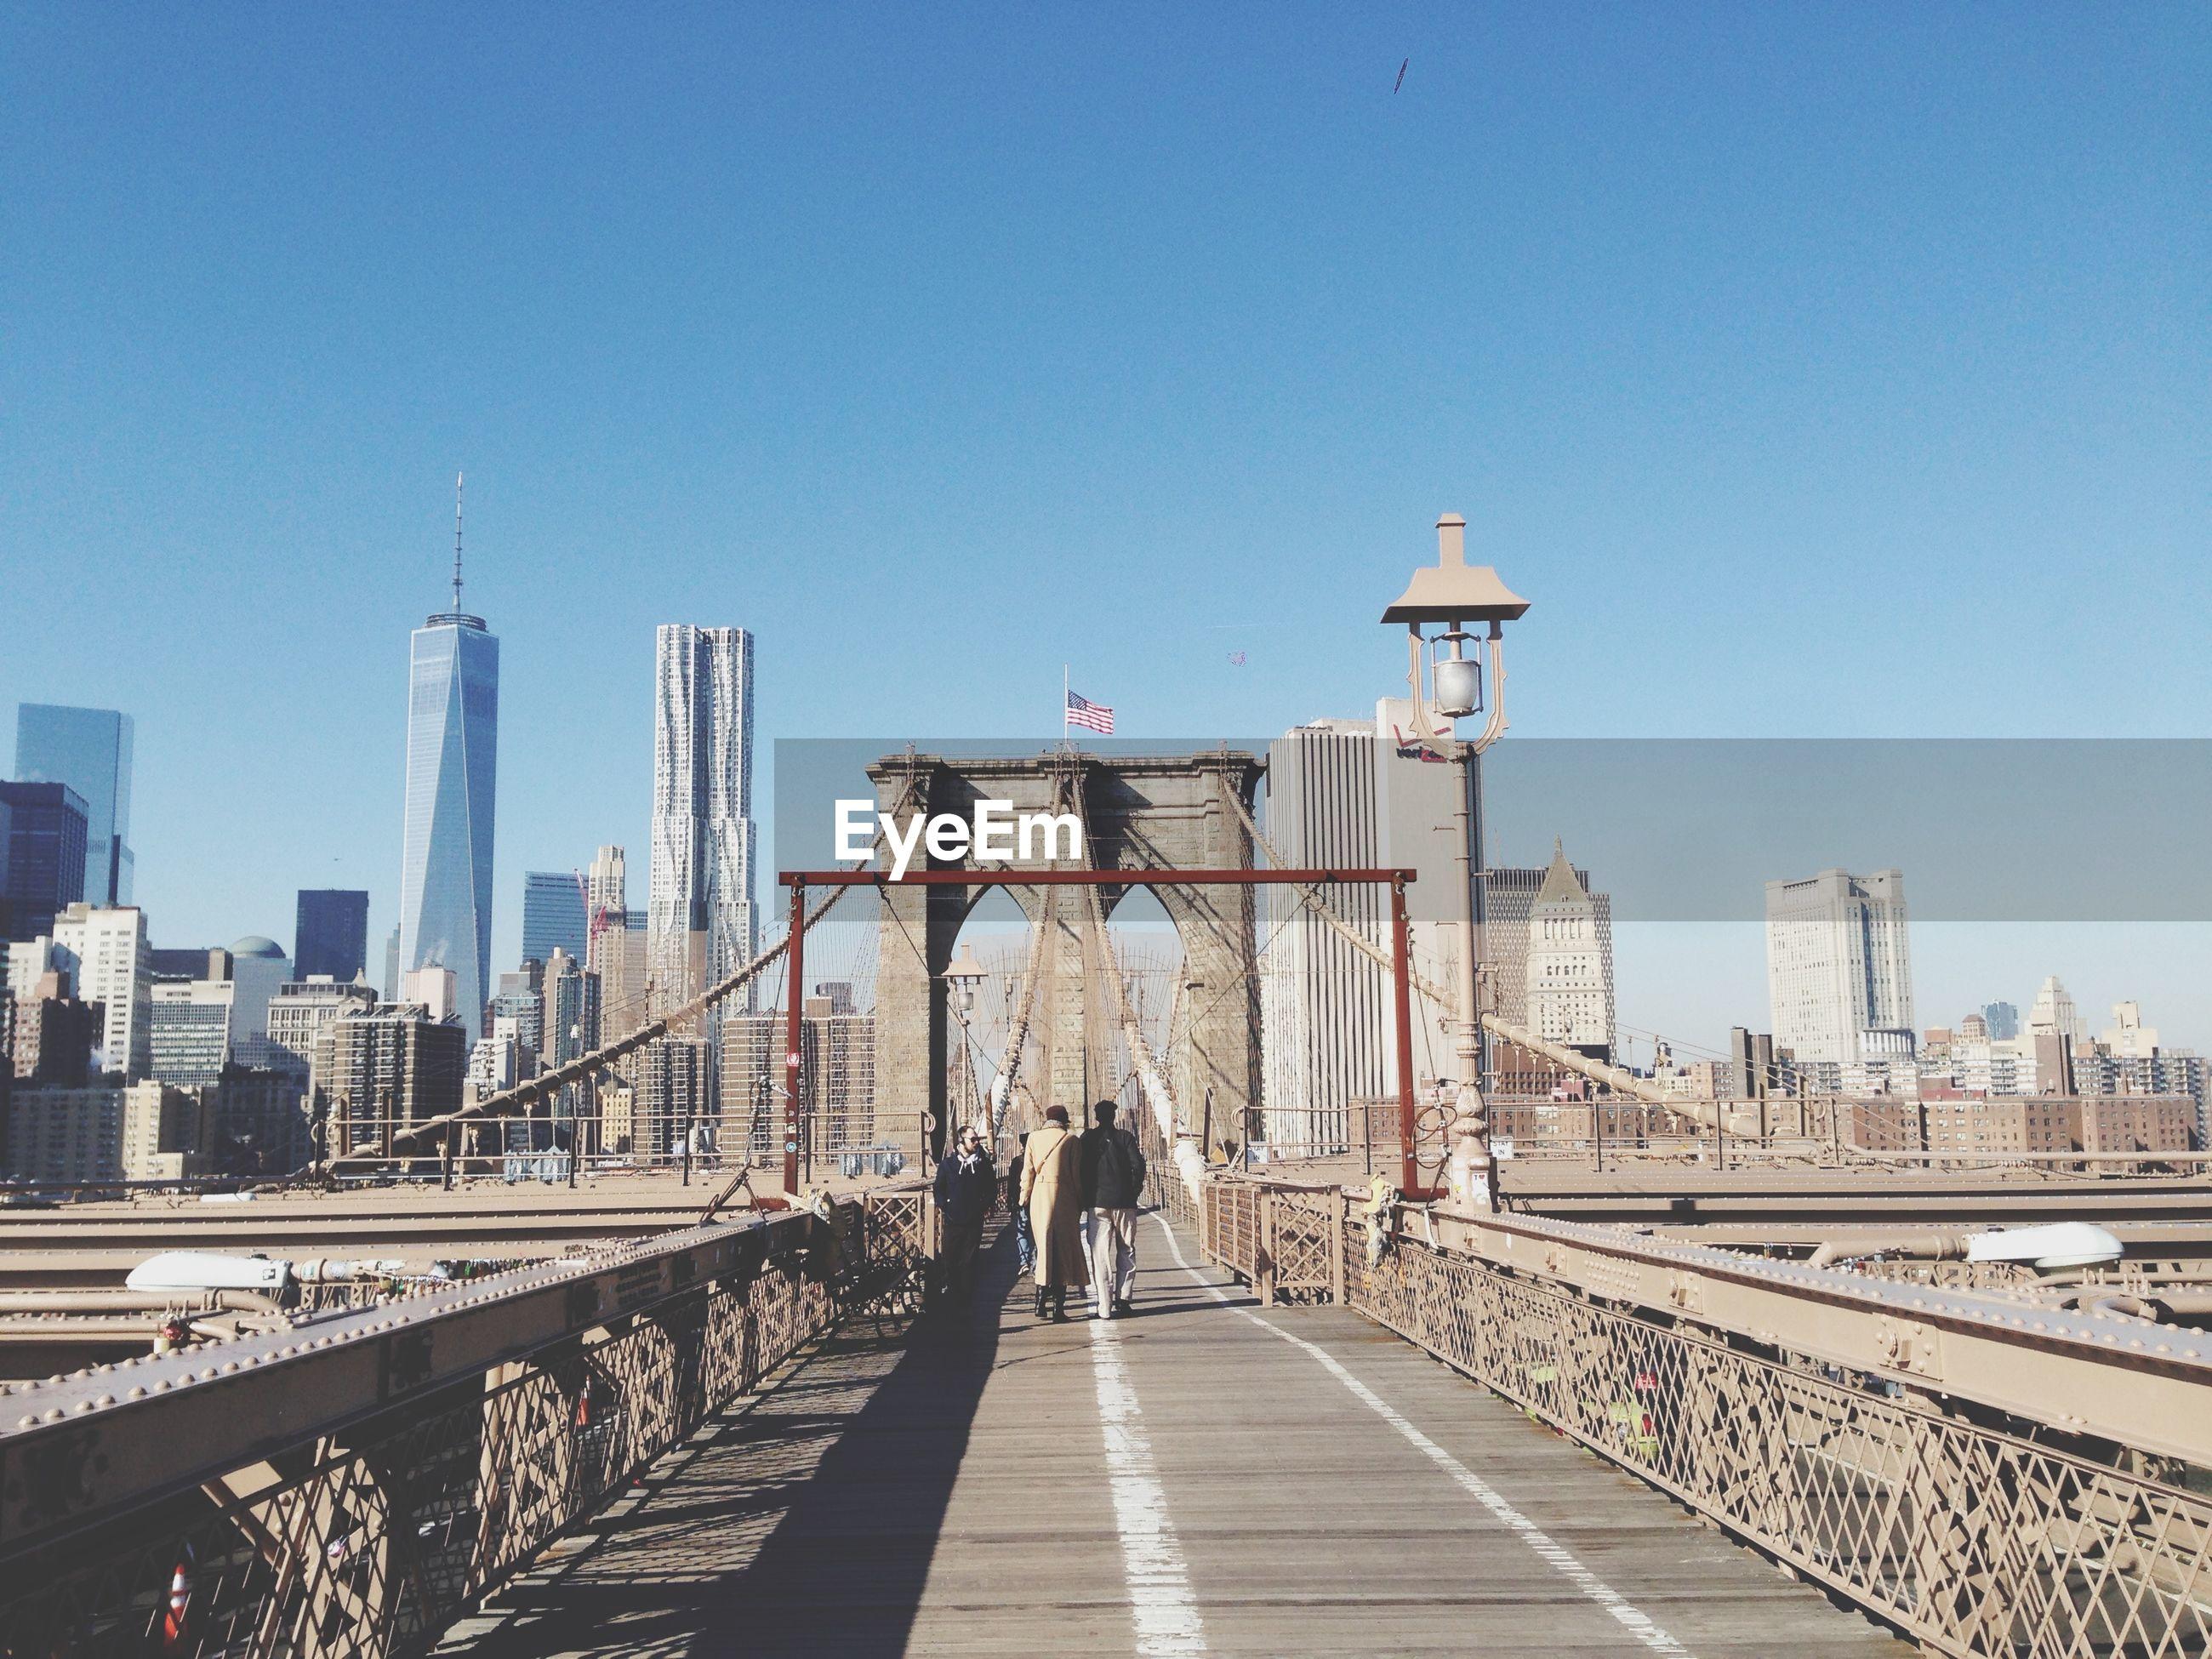 Rear view of people walking on brooklyn bridge by city against clear blue sky